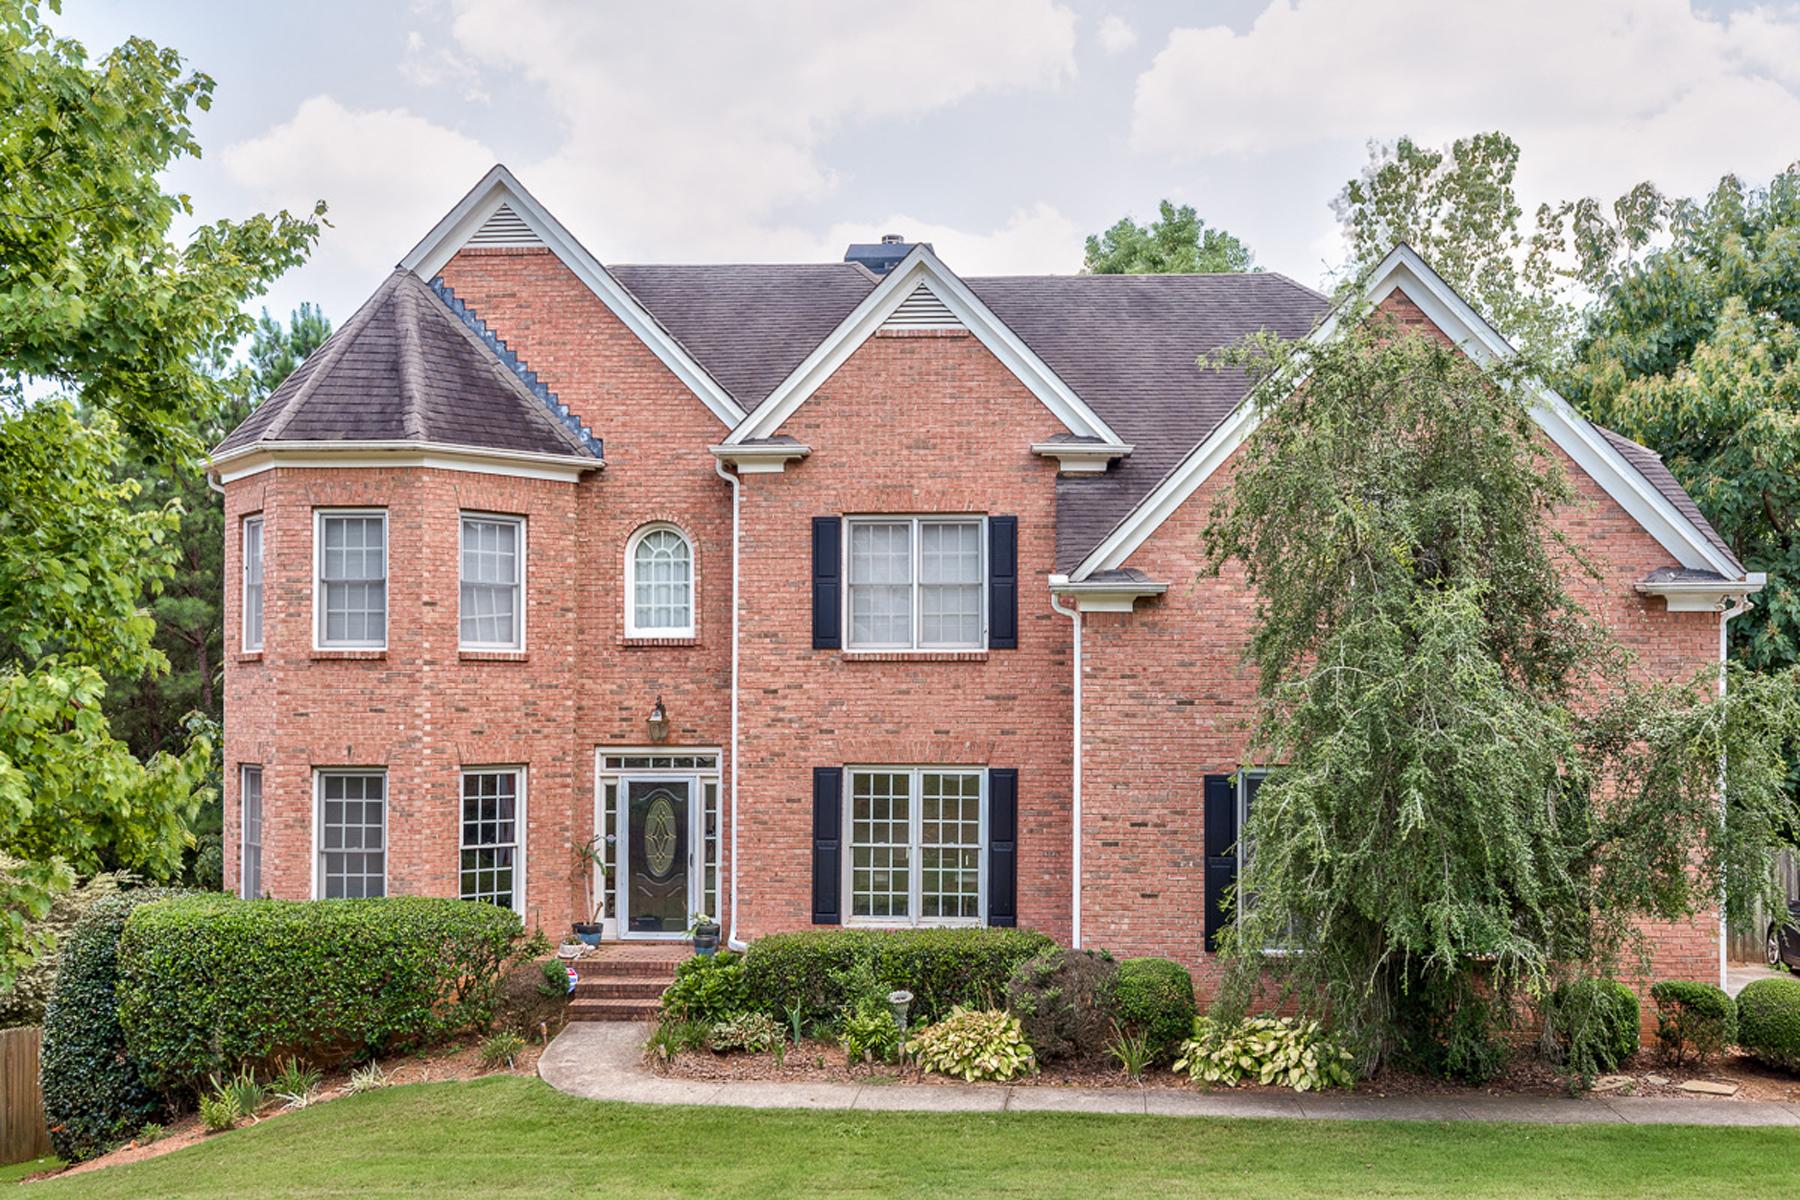 独户住宅 为 销售 在 Great Home On Quiet Cul-de-sac Inside The Perimeter 550 Woodmoore Court Sandy Springs, 乔治亚州 30342 美国